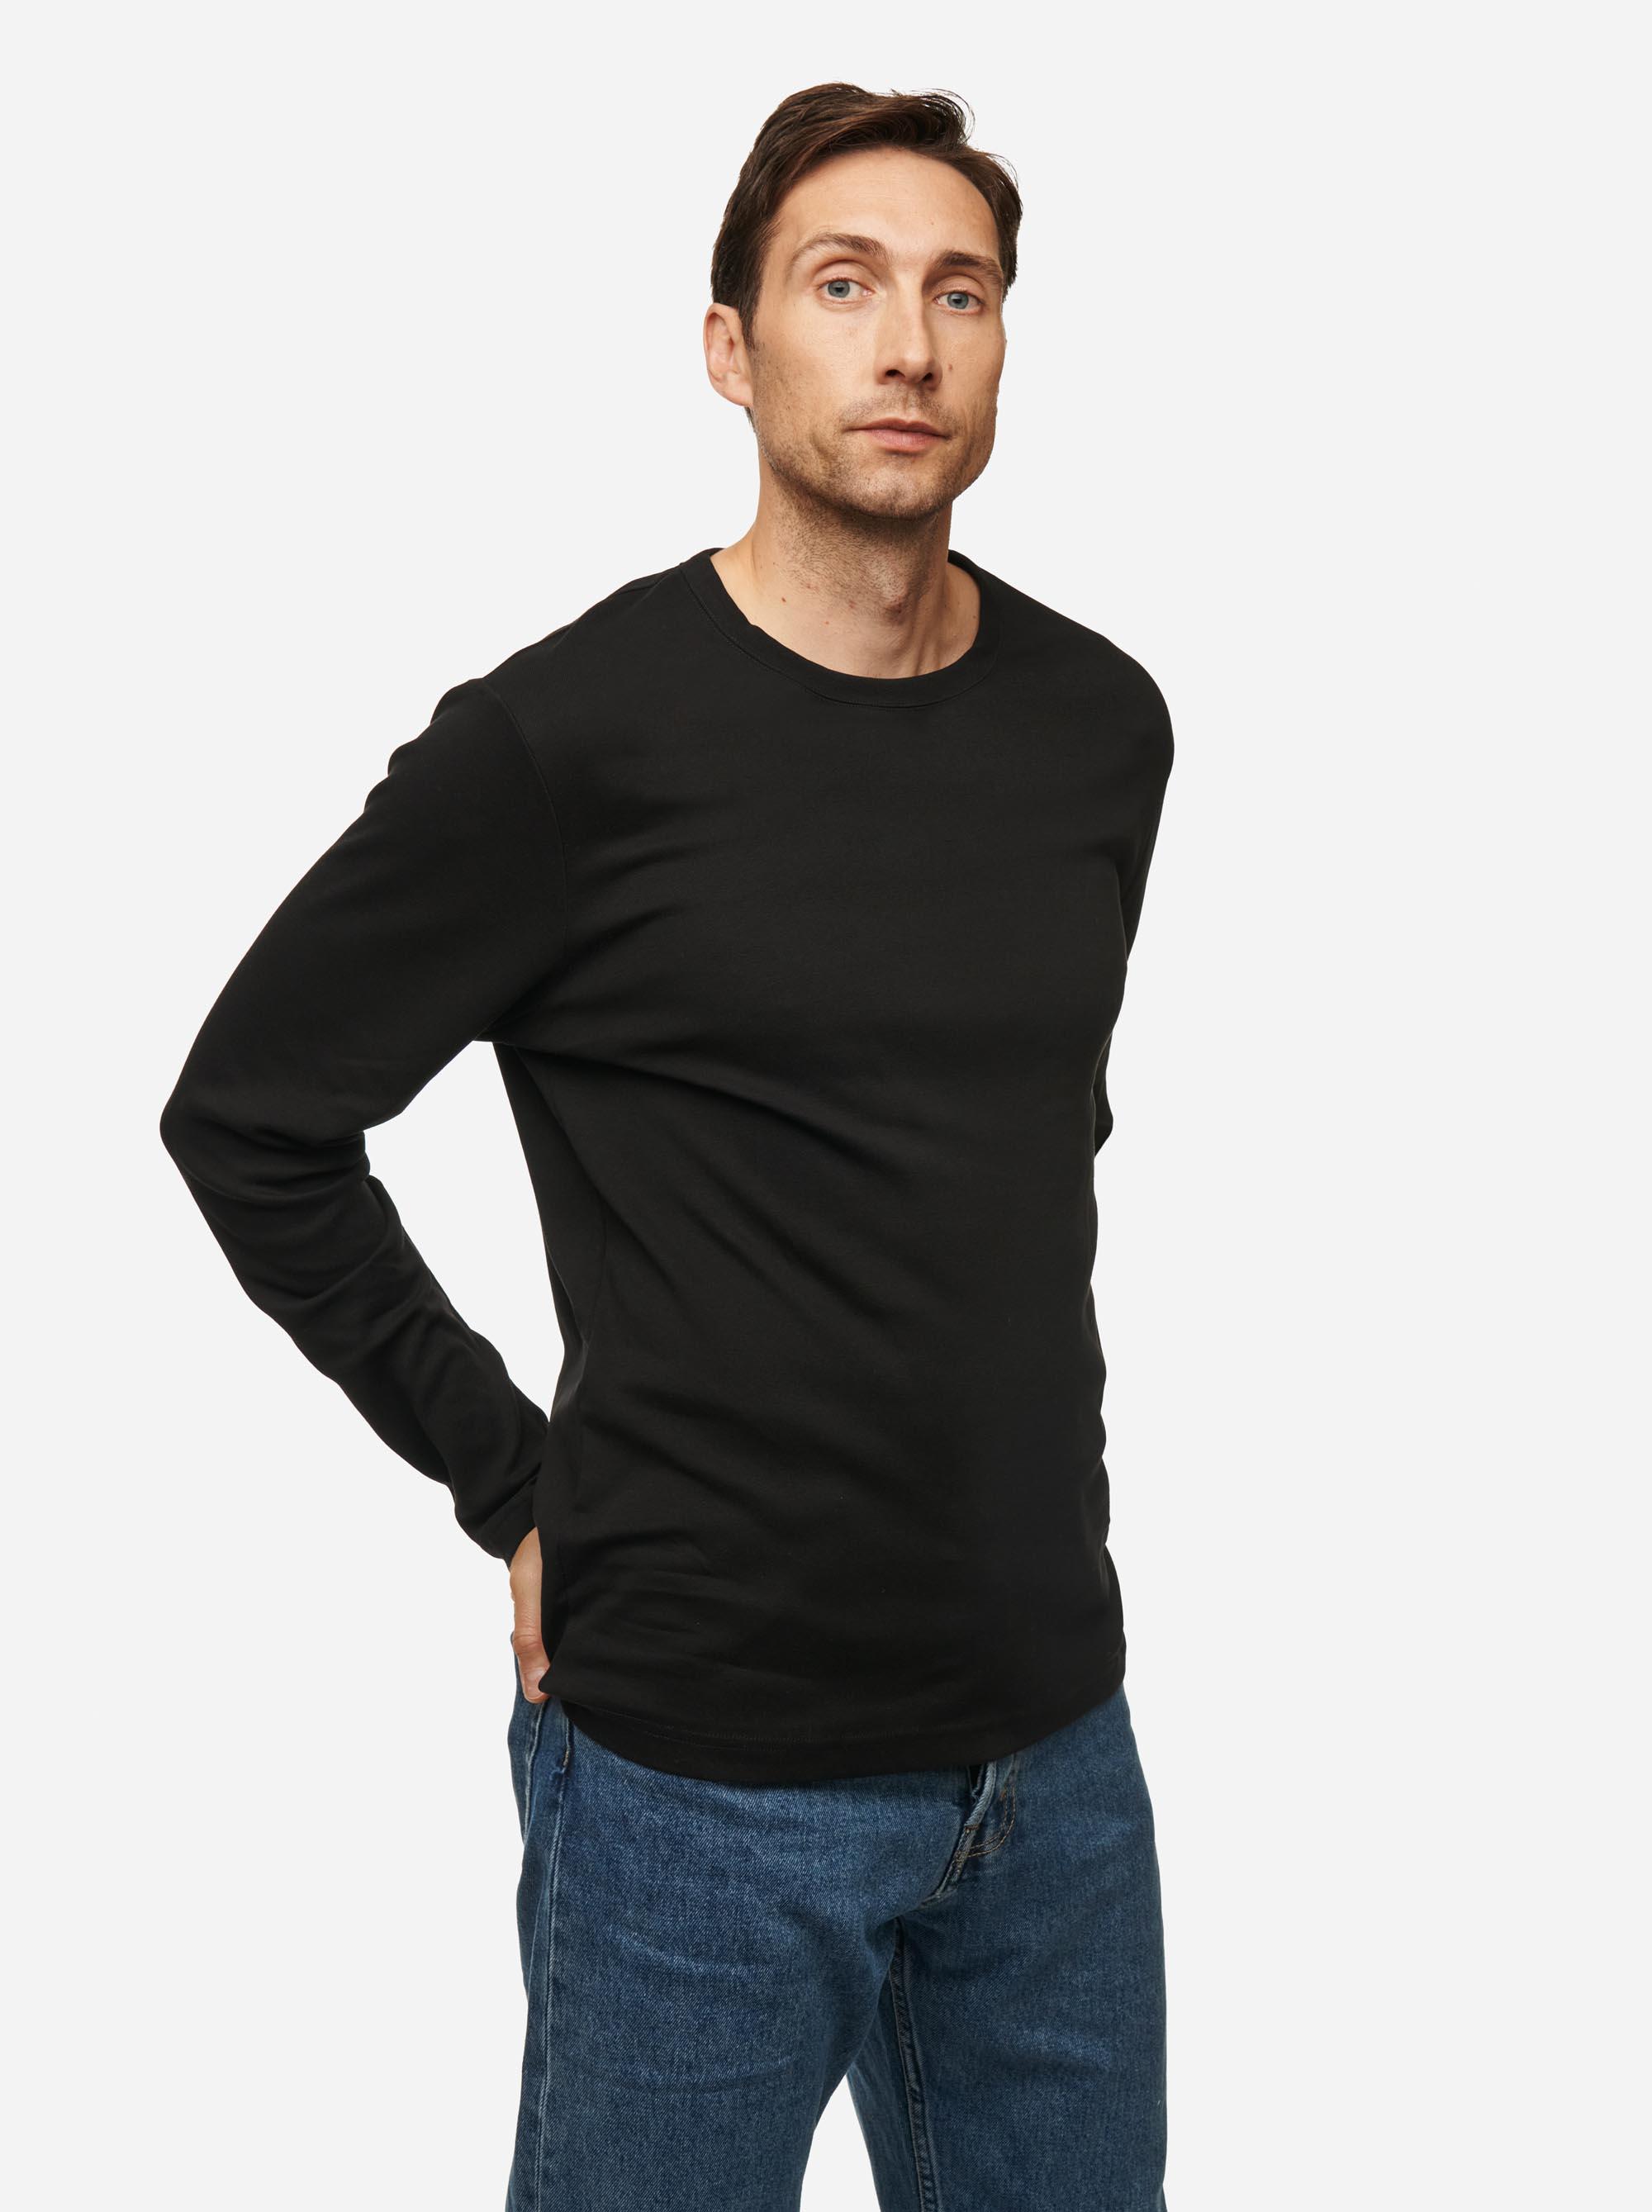 Teym - The-T-Shirt - Longsleeve - Men - Black - 2